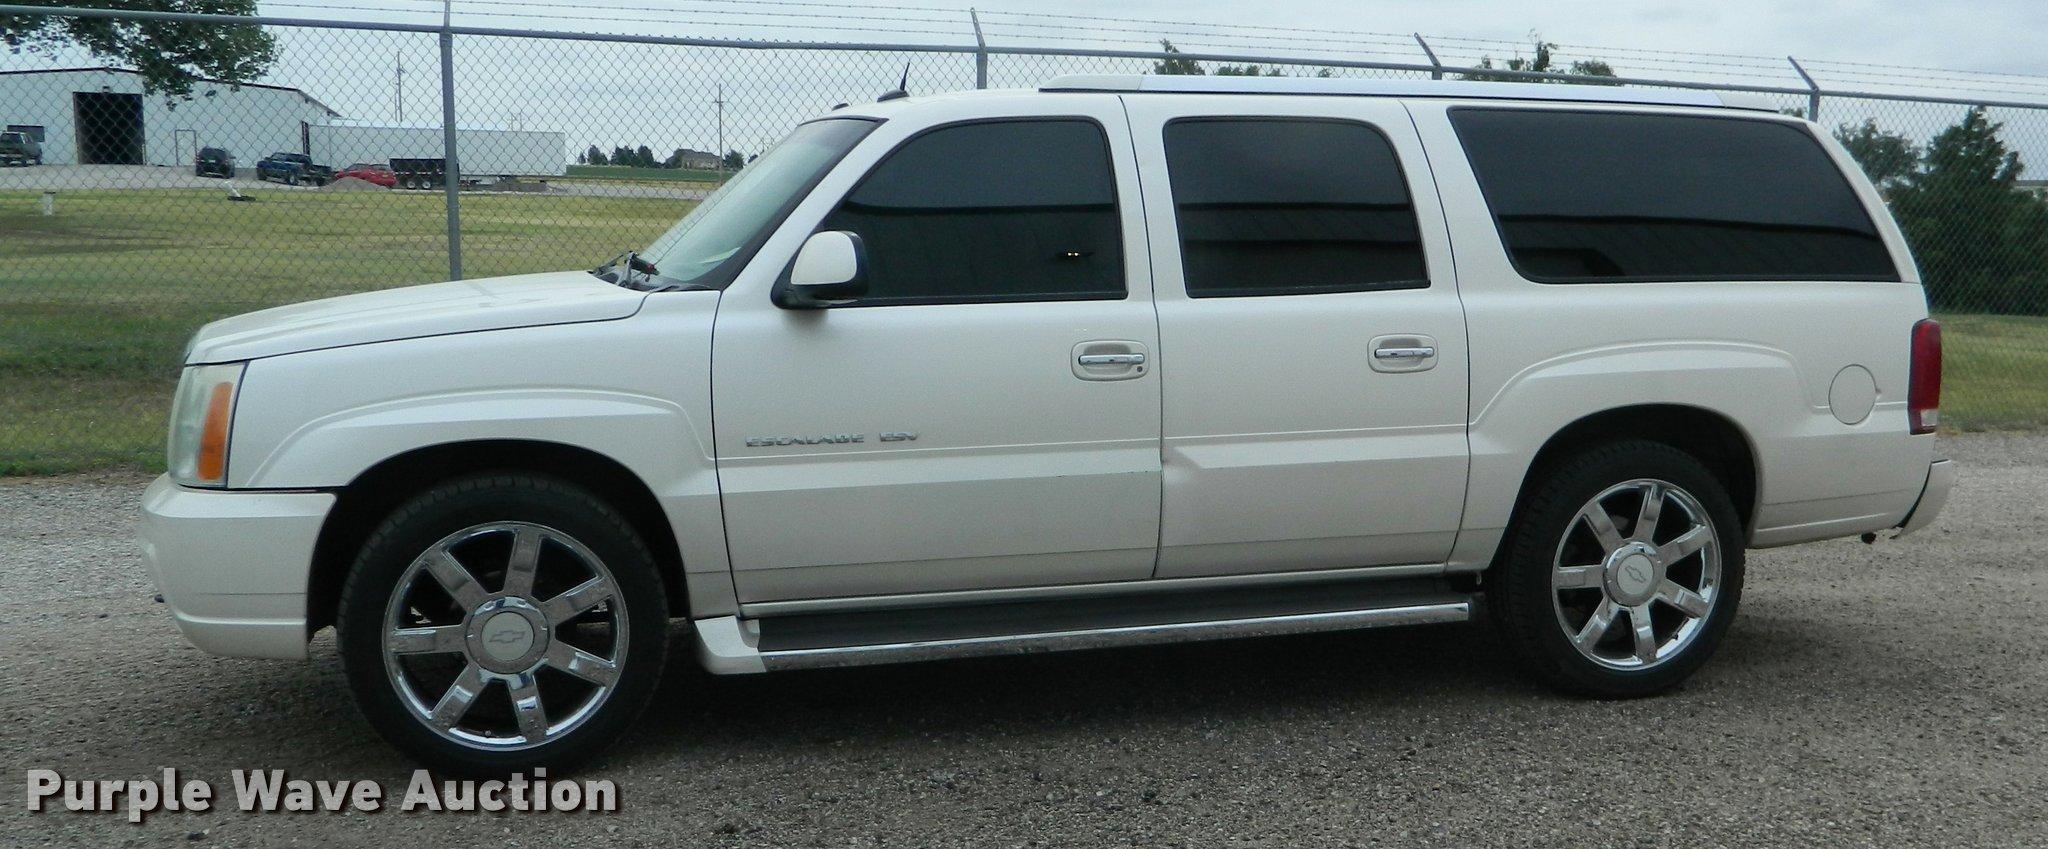 2005 Cadillac Escalade Esv Suv Item Db1123 Sold Septemb 2004 Trailer Wiring Full Size In New Window